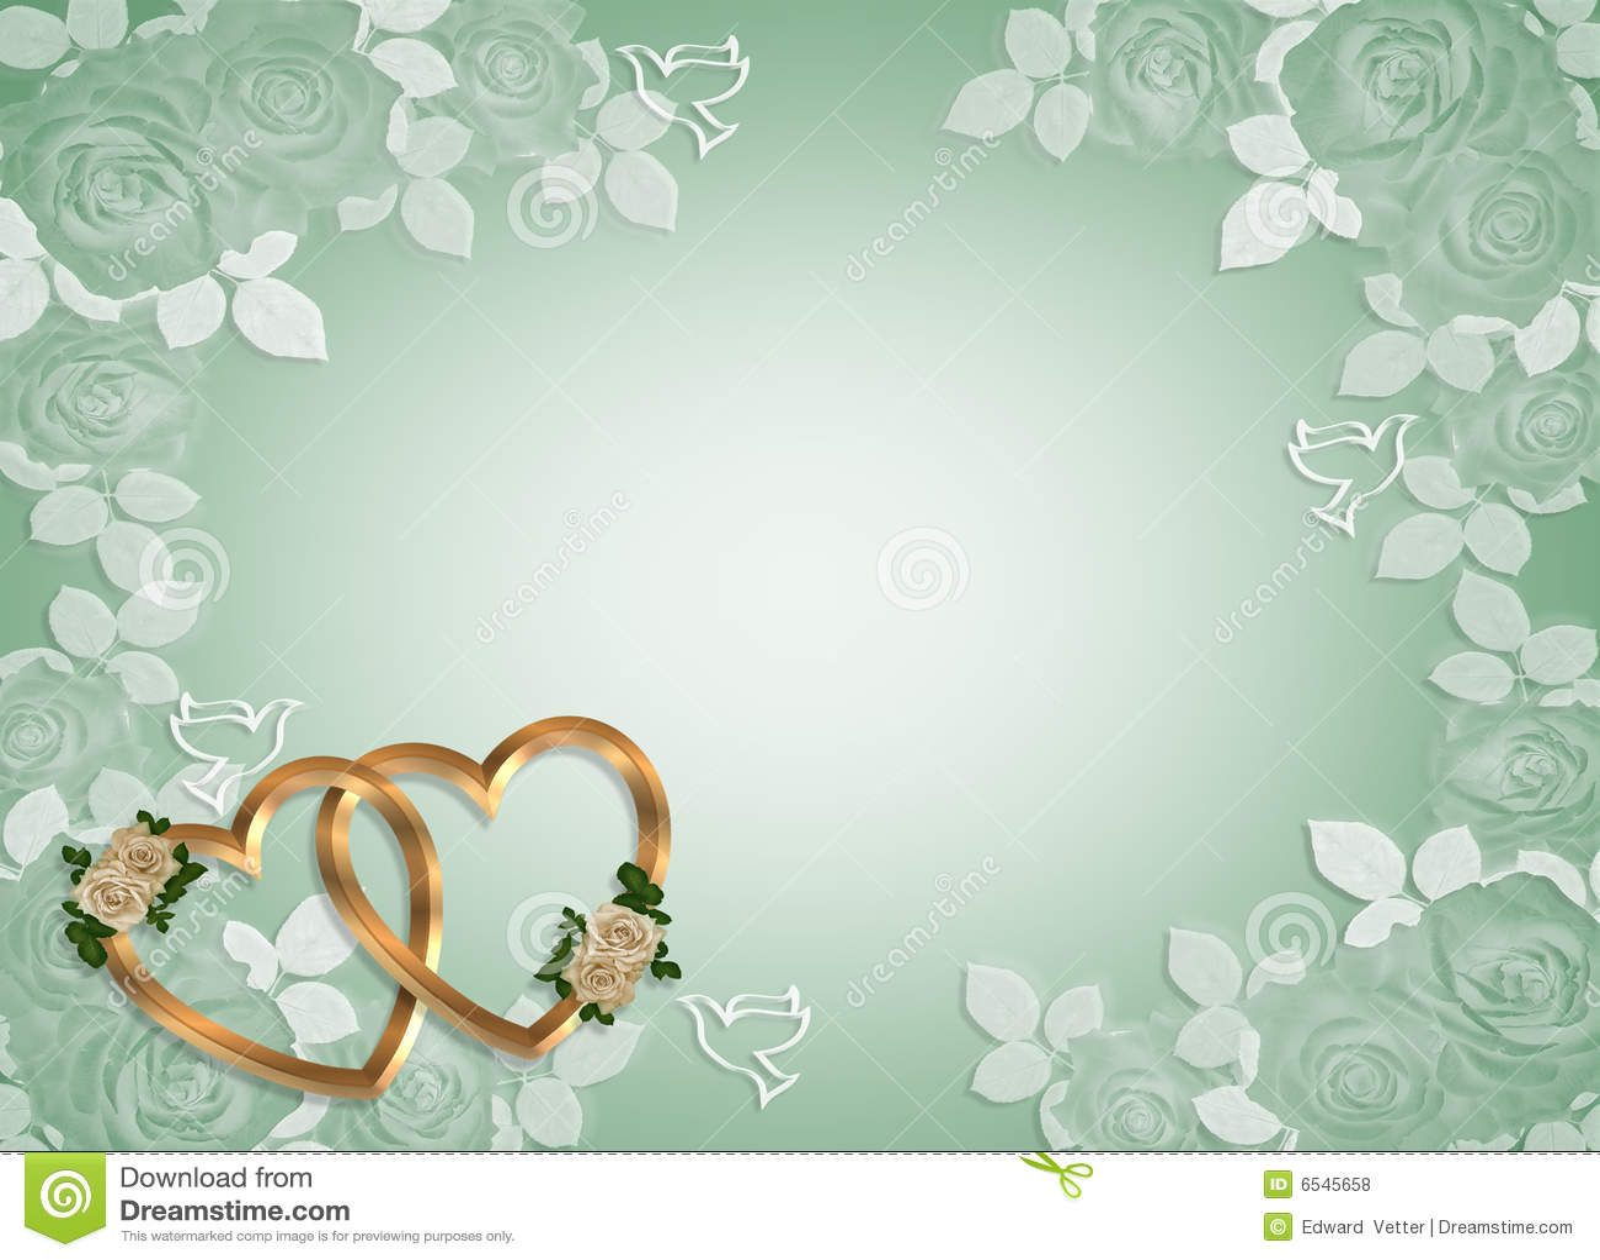 Wedding Invitation Gold Hearts Stock Illustration Illustration Of